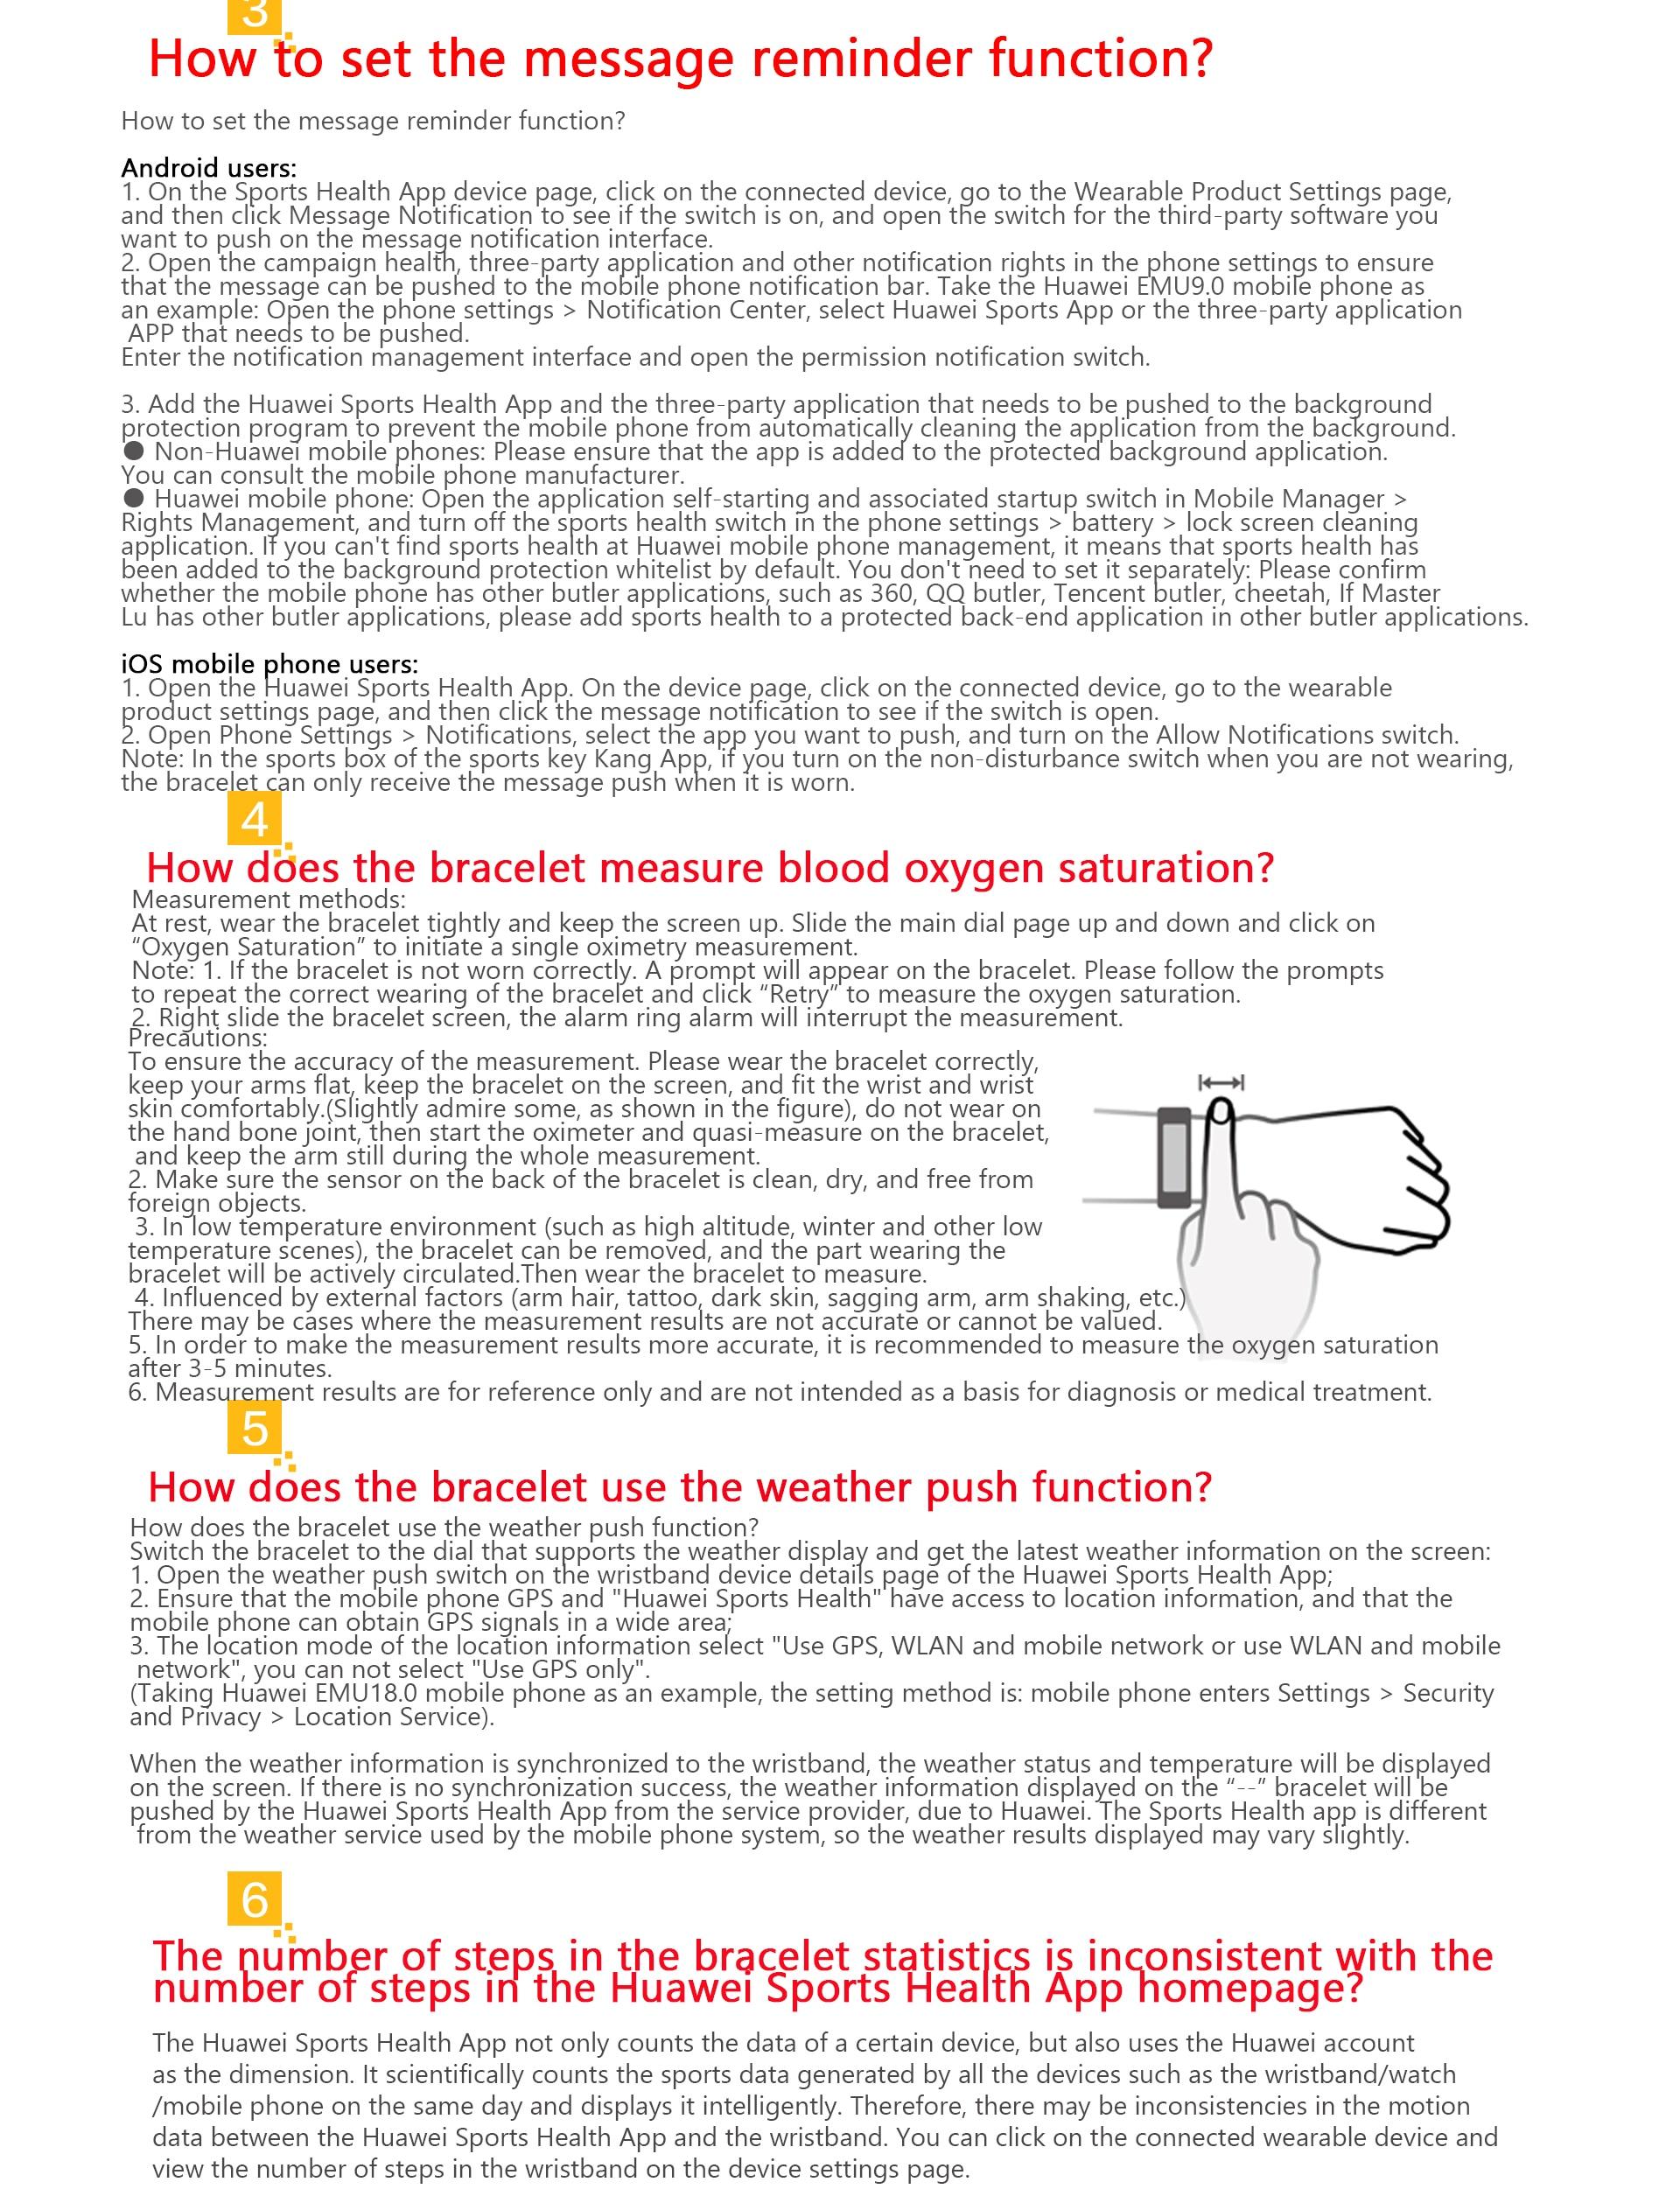 H5c43698271344e24bc504fb2d49c55deV Honor Band 5i Wristband Smart Bracelet USB Charging Music Control Blood Oxygen Monitoring Sports Fitness Bracelet Running Tracke